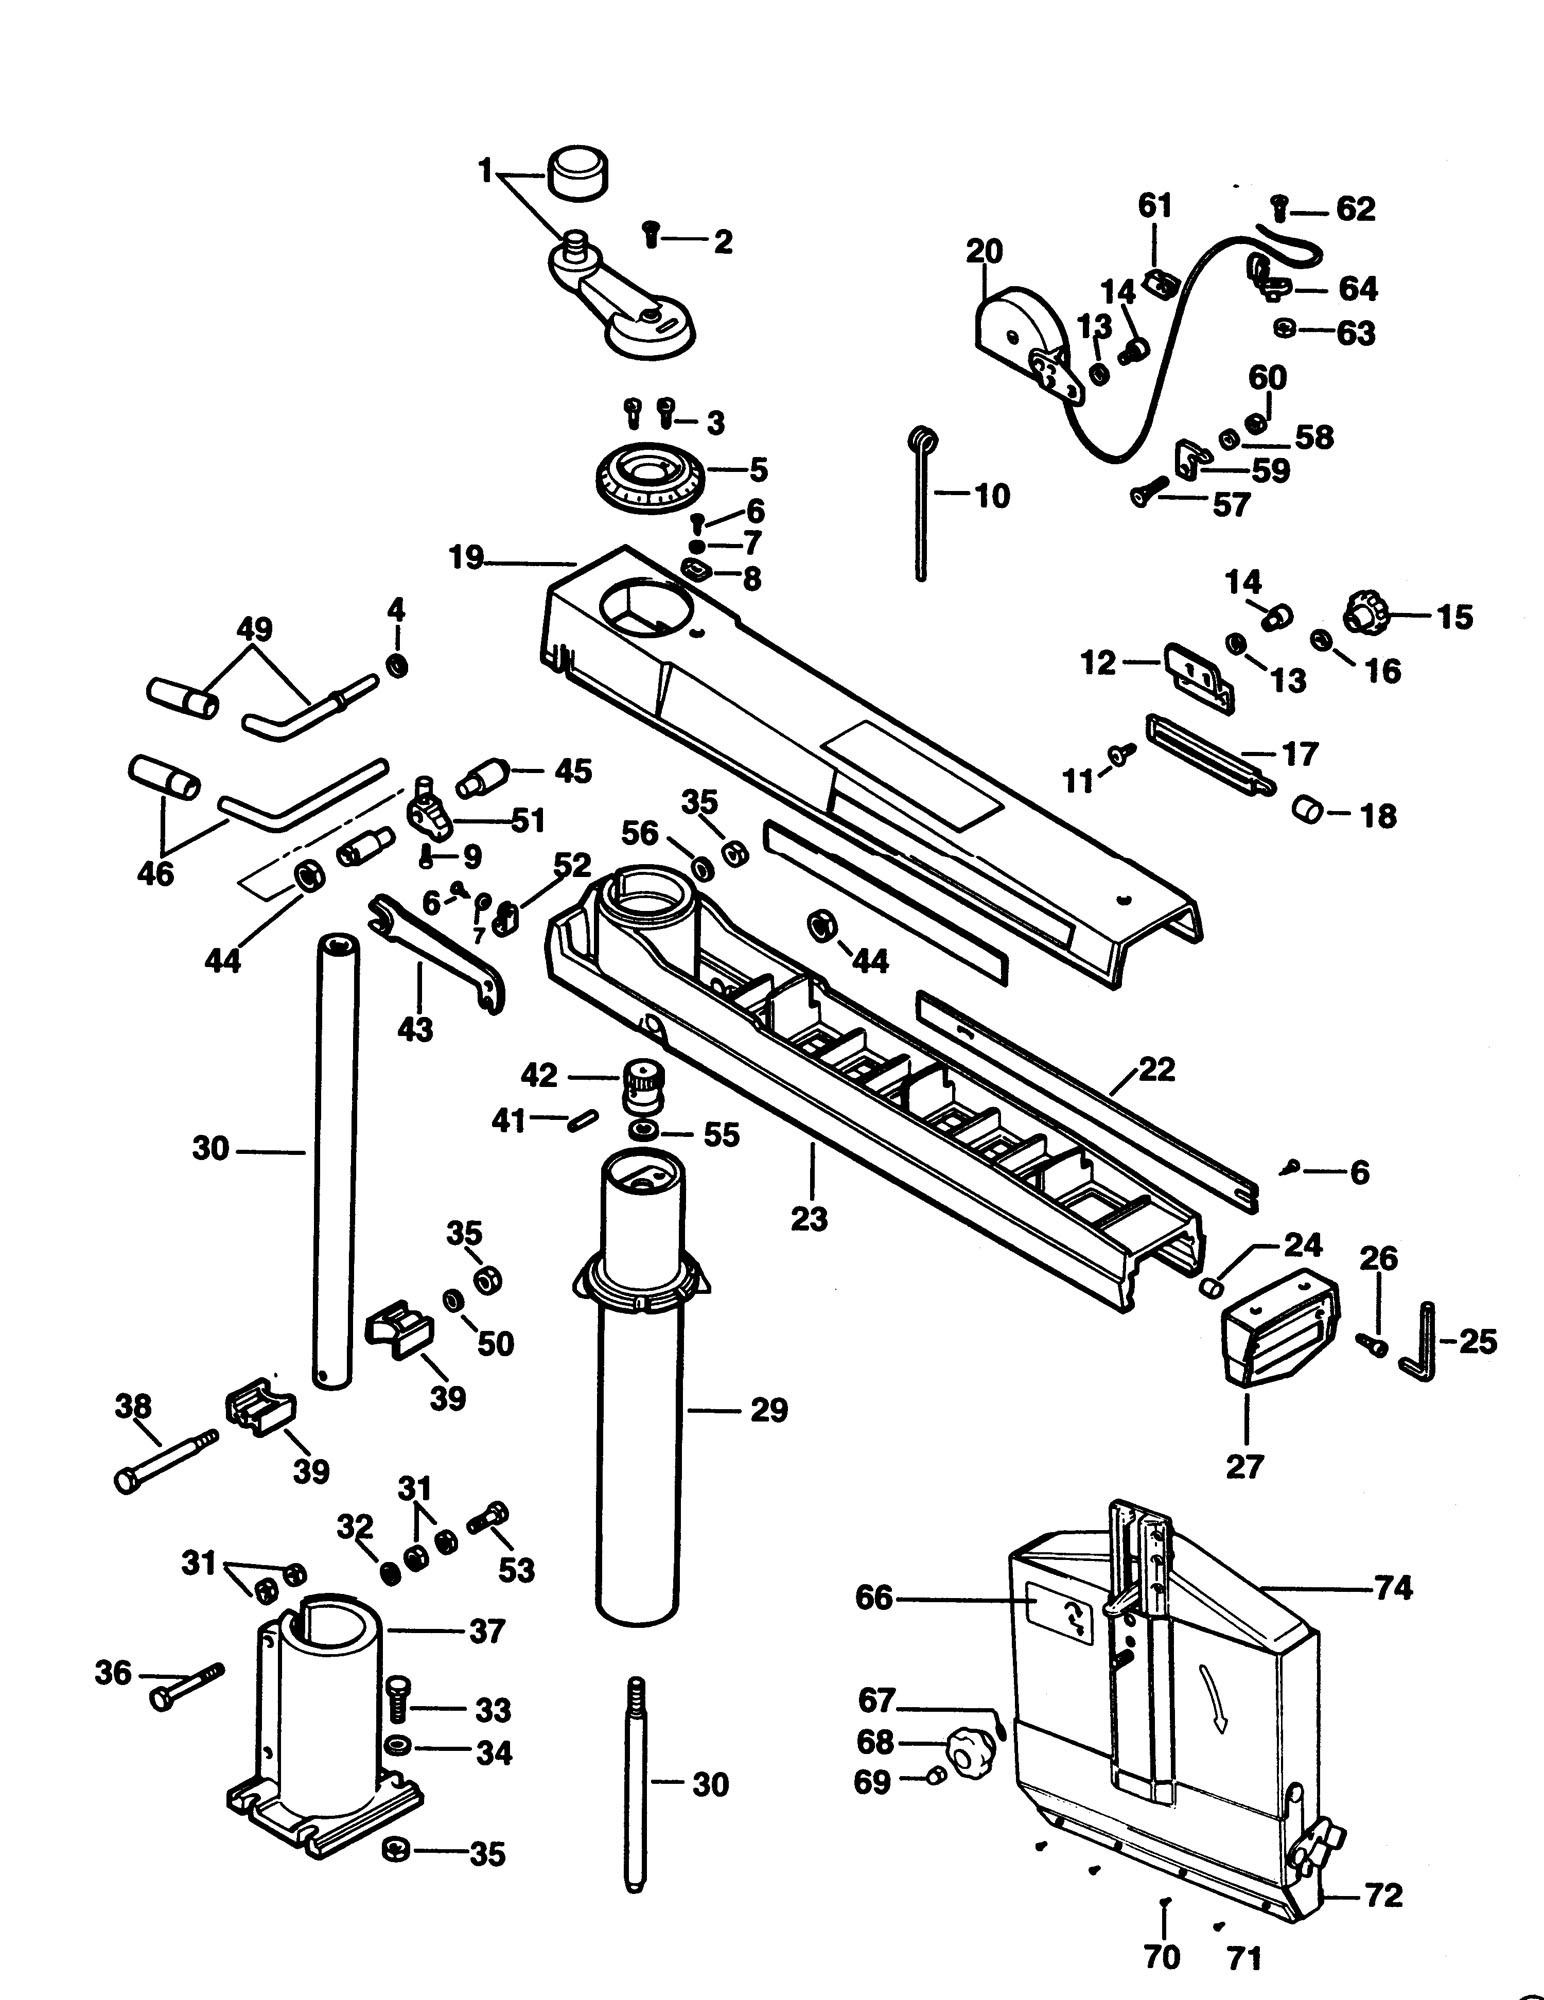 Spares for Elu Ras1251 Radial Arm Saw (type 1ce) SPARE